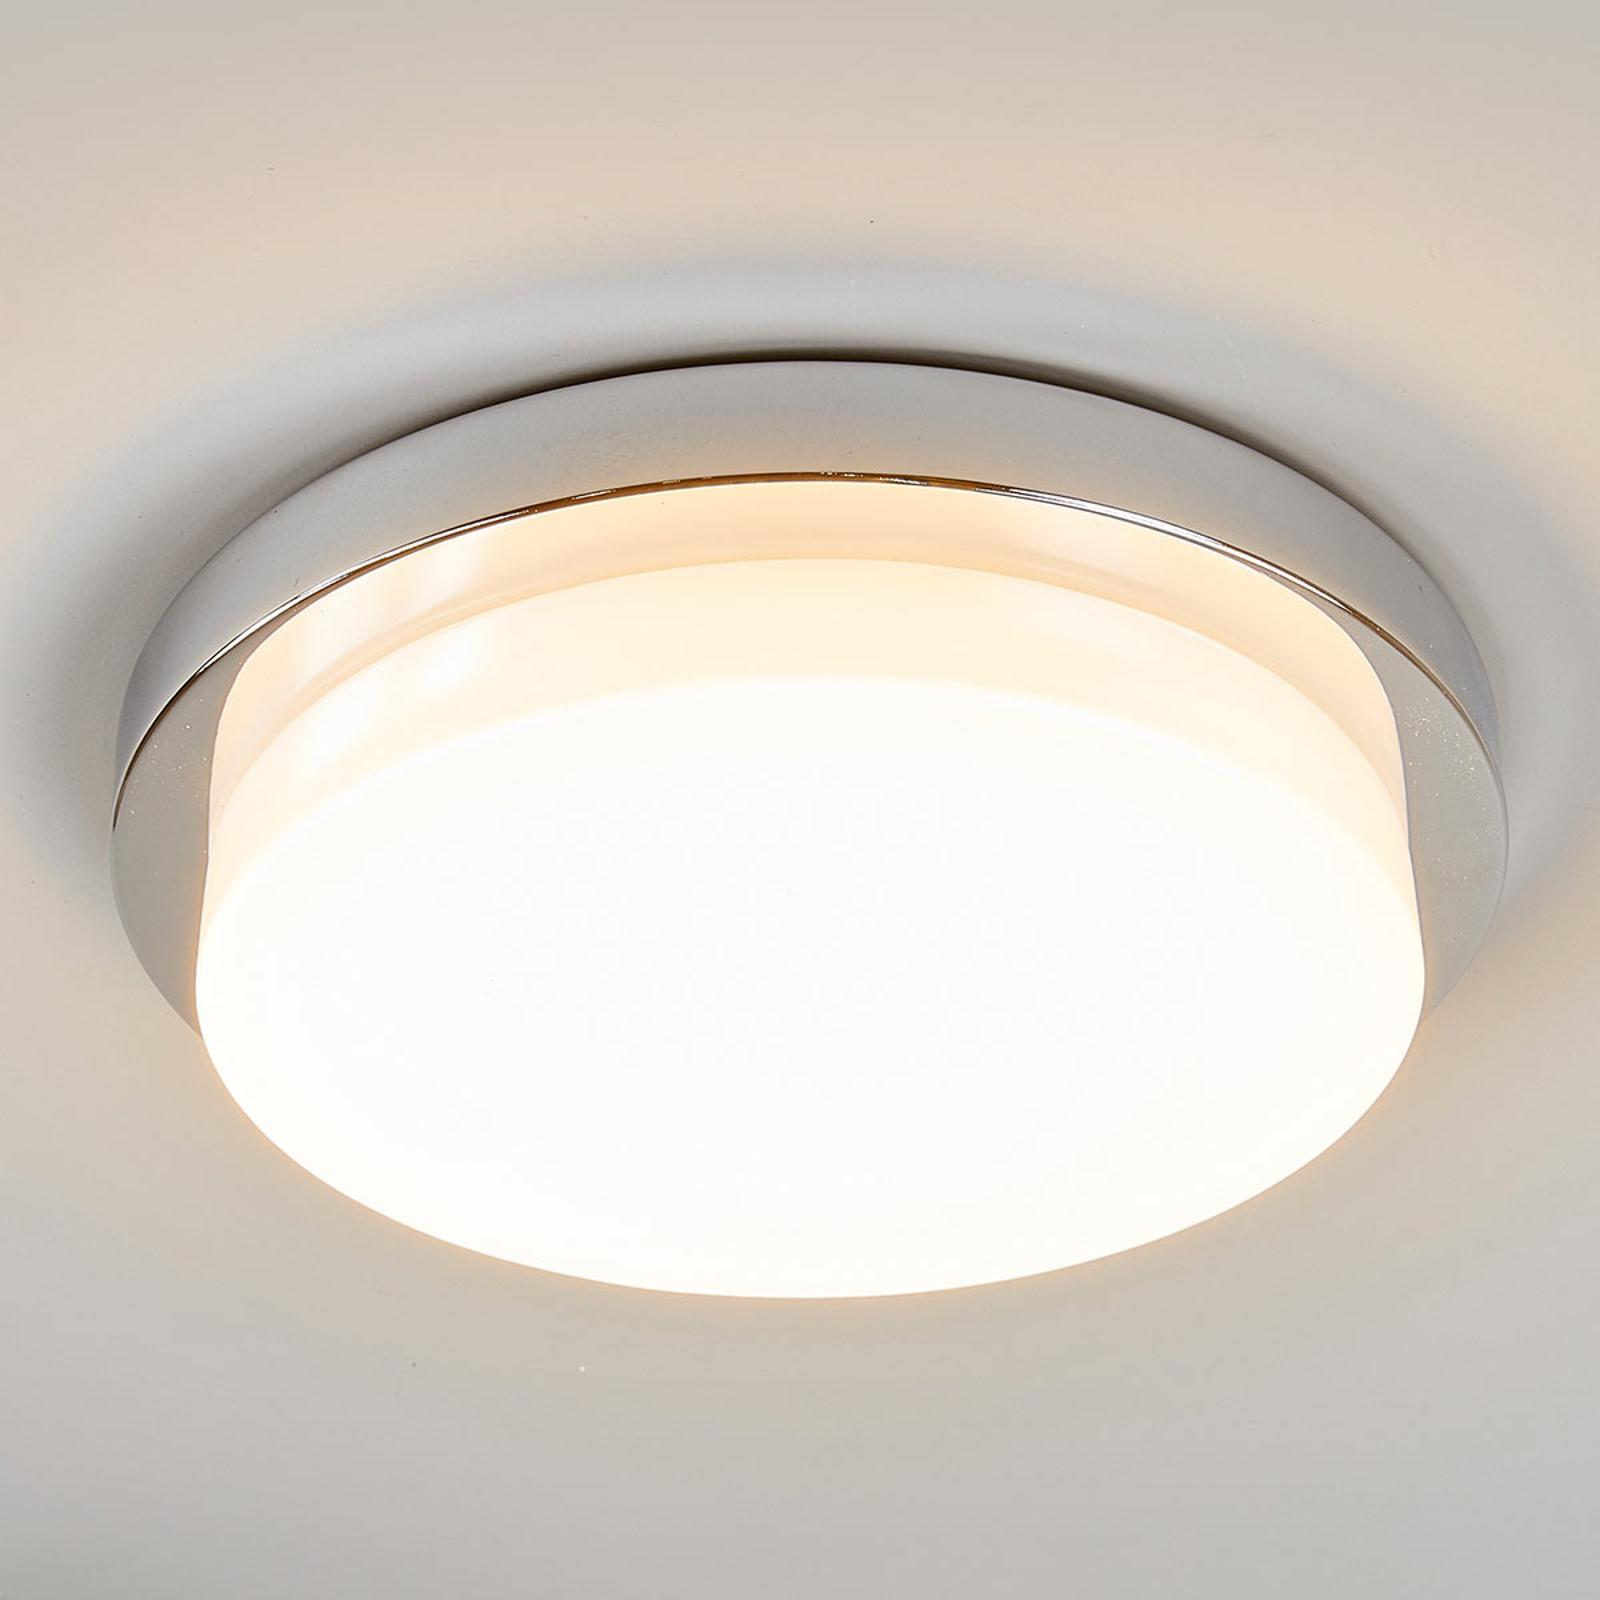 Glossy chrome LED ceiling light Cordula, IP44_9641094_1